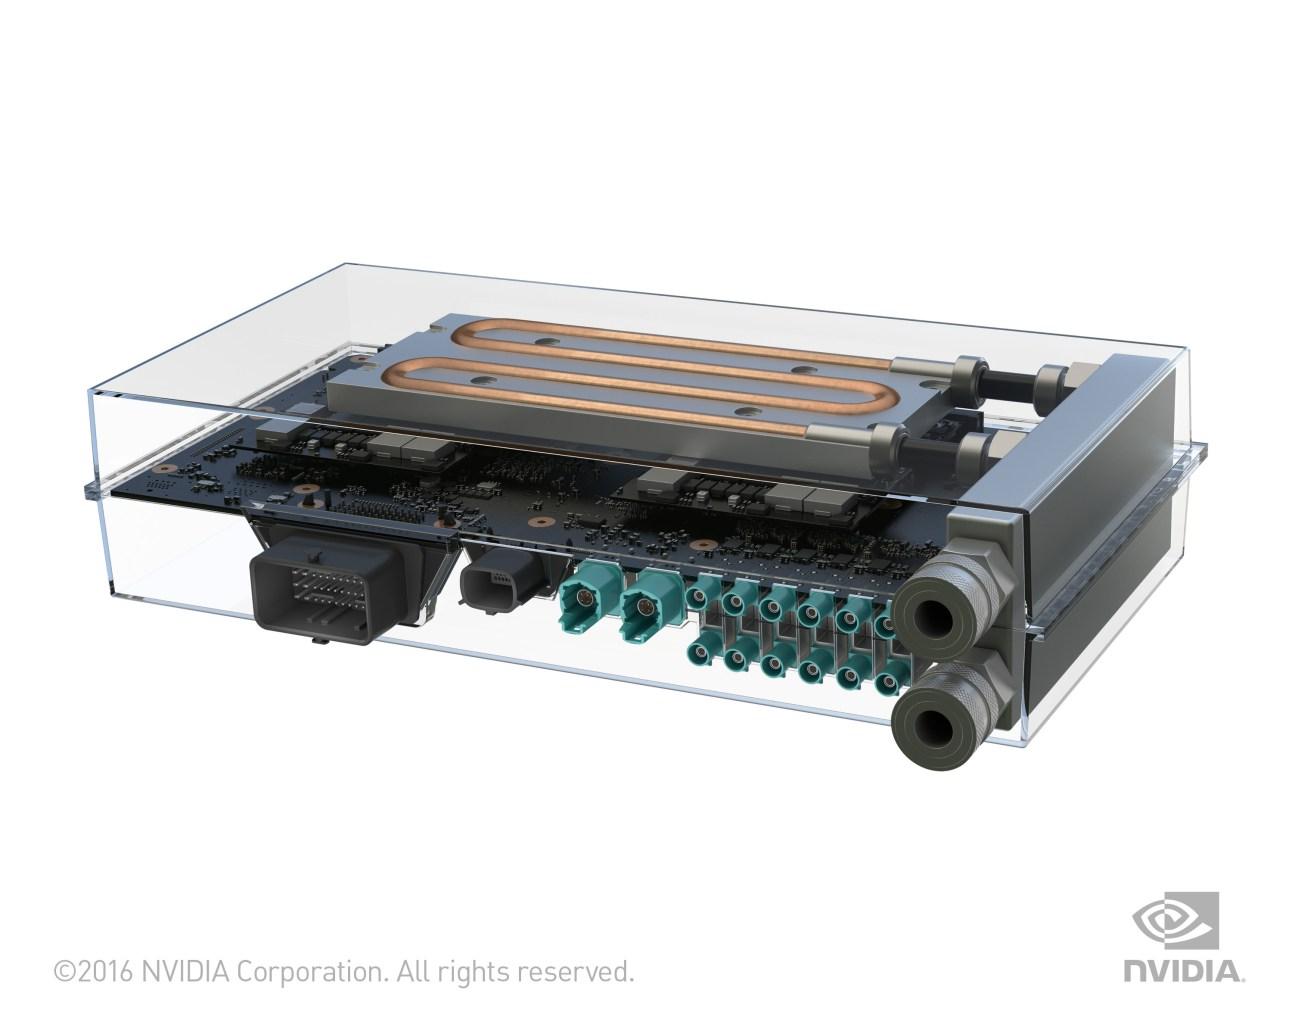 nvidia_drive-px2-050116-2